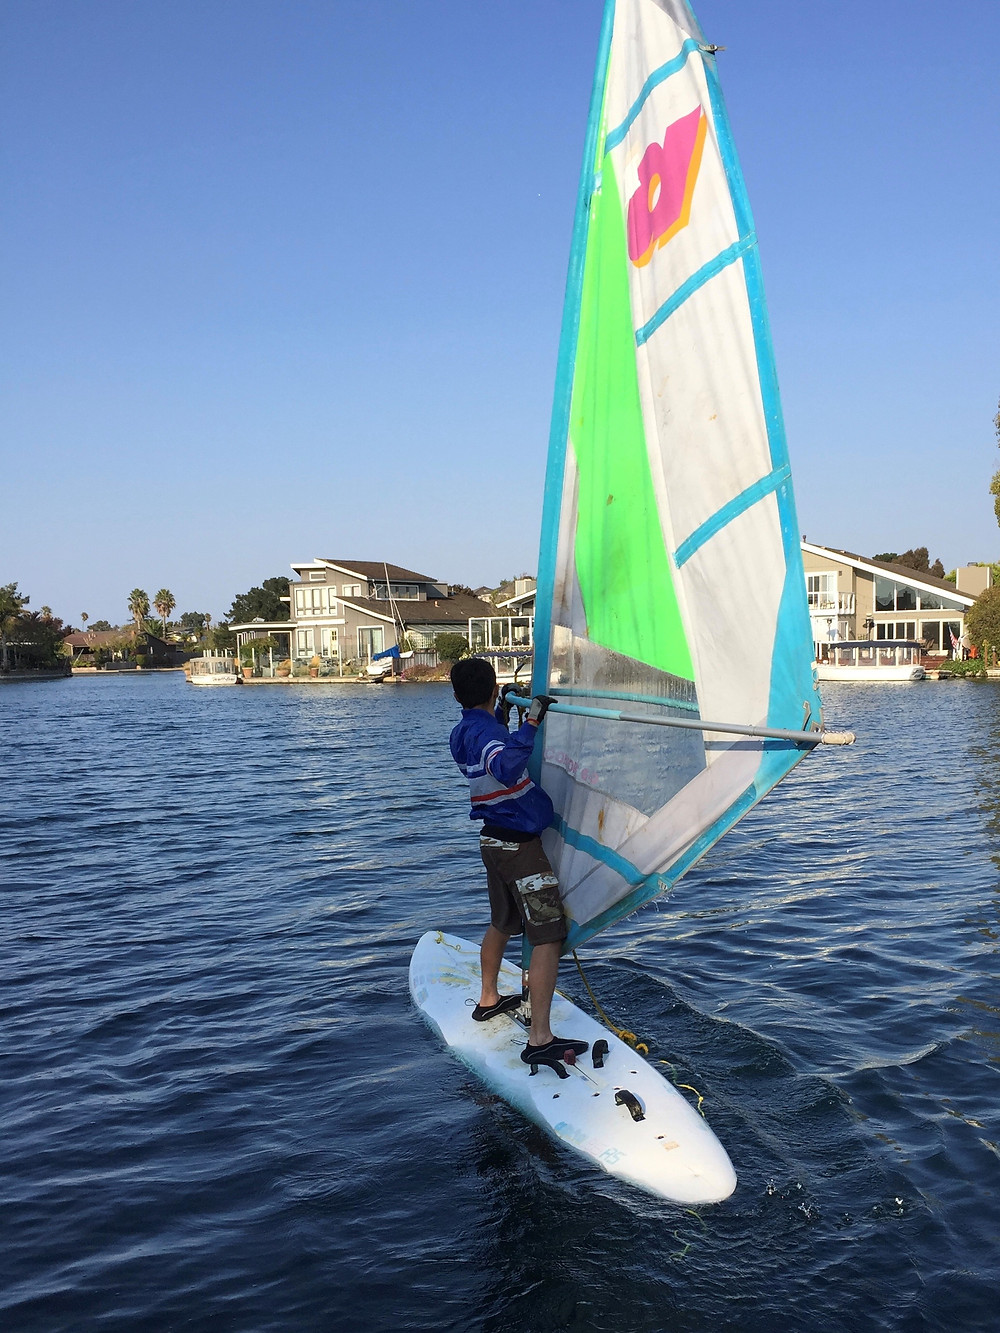 Raymond windsurfing